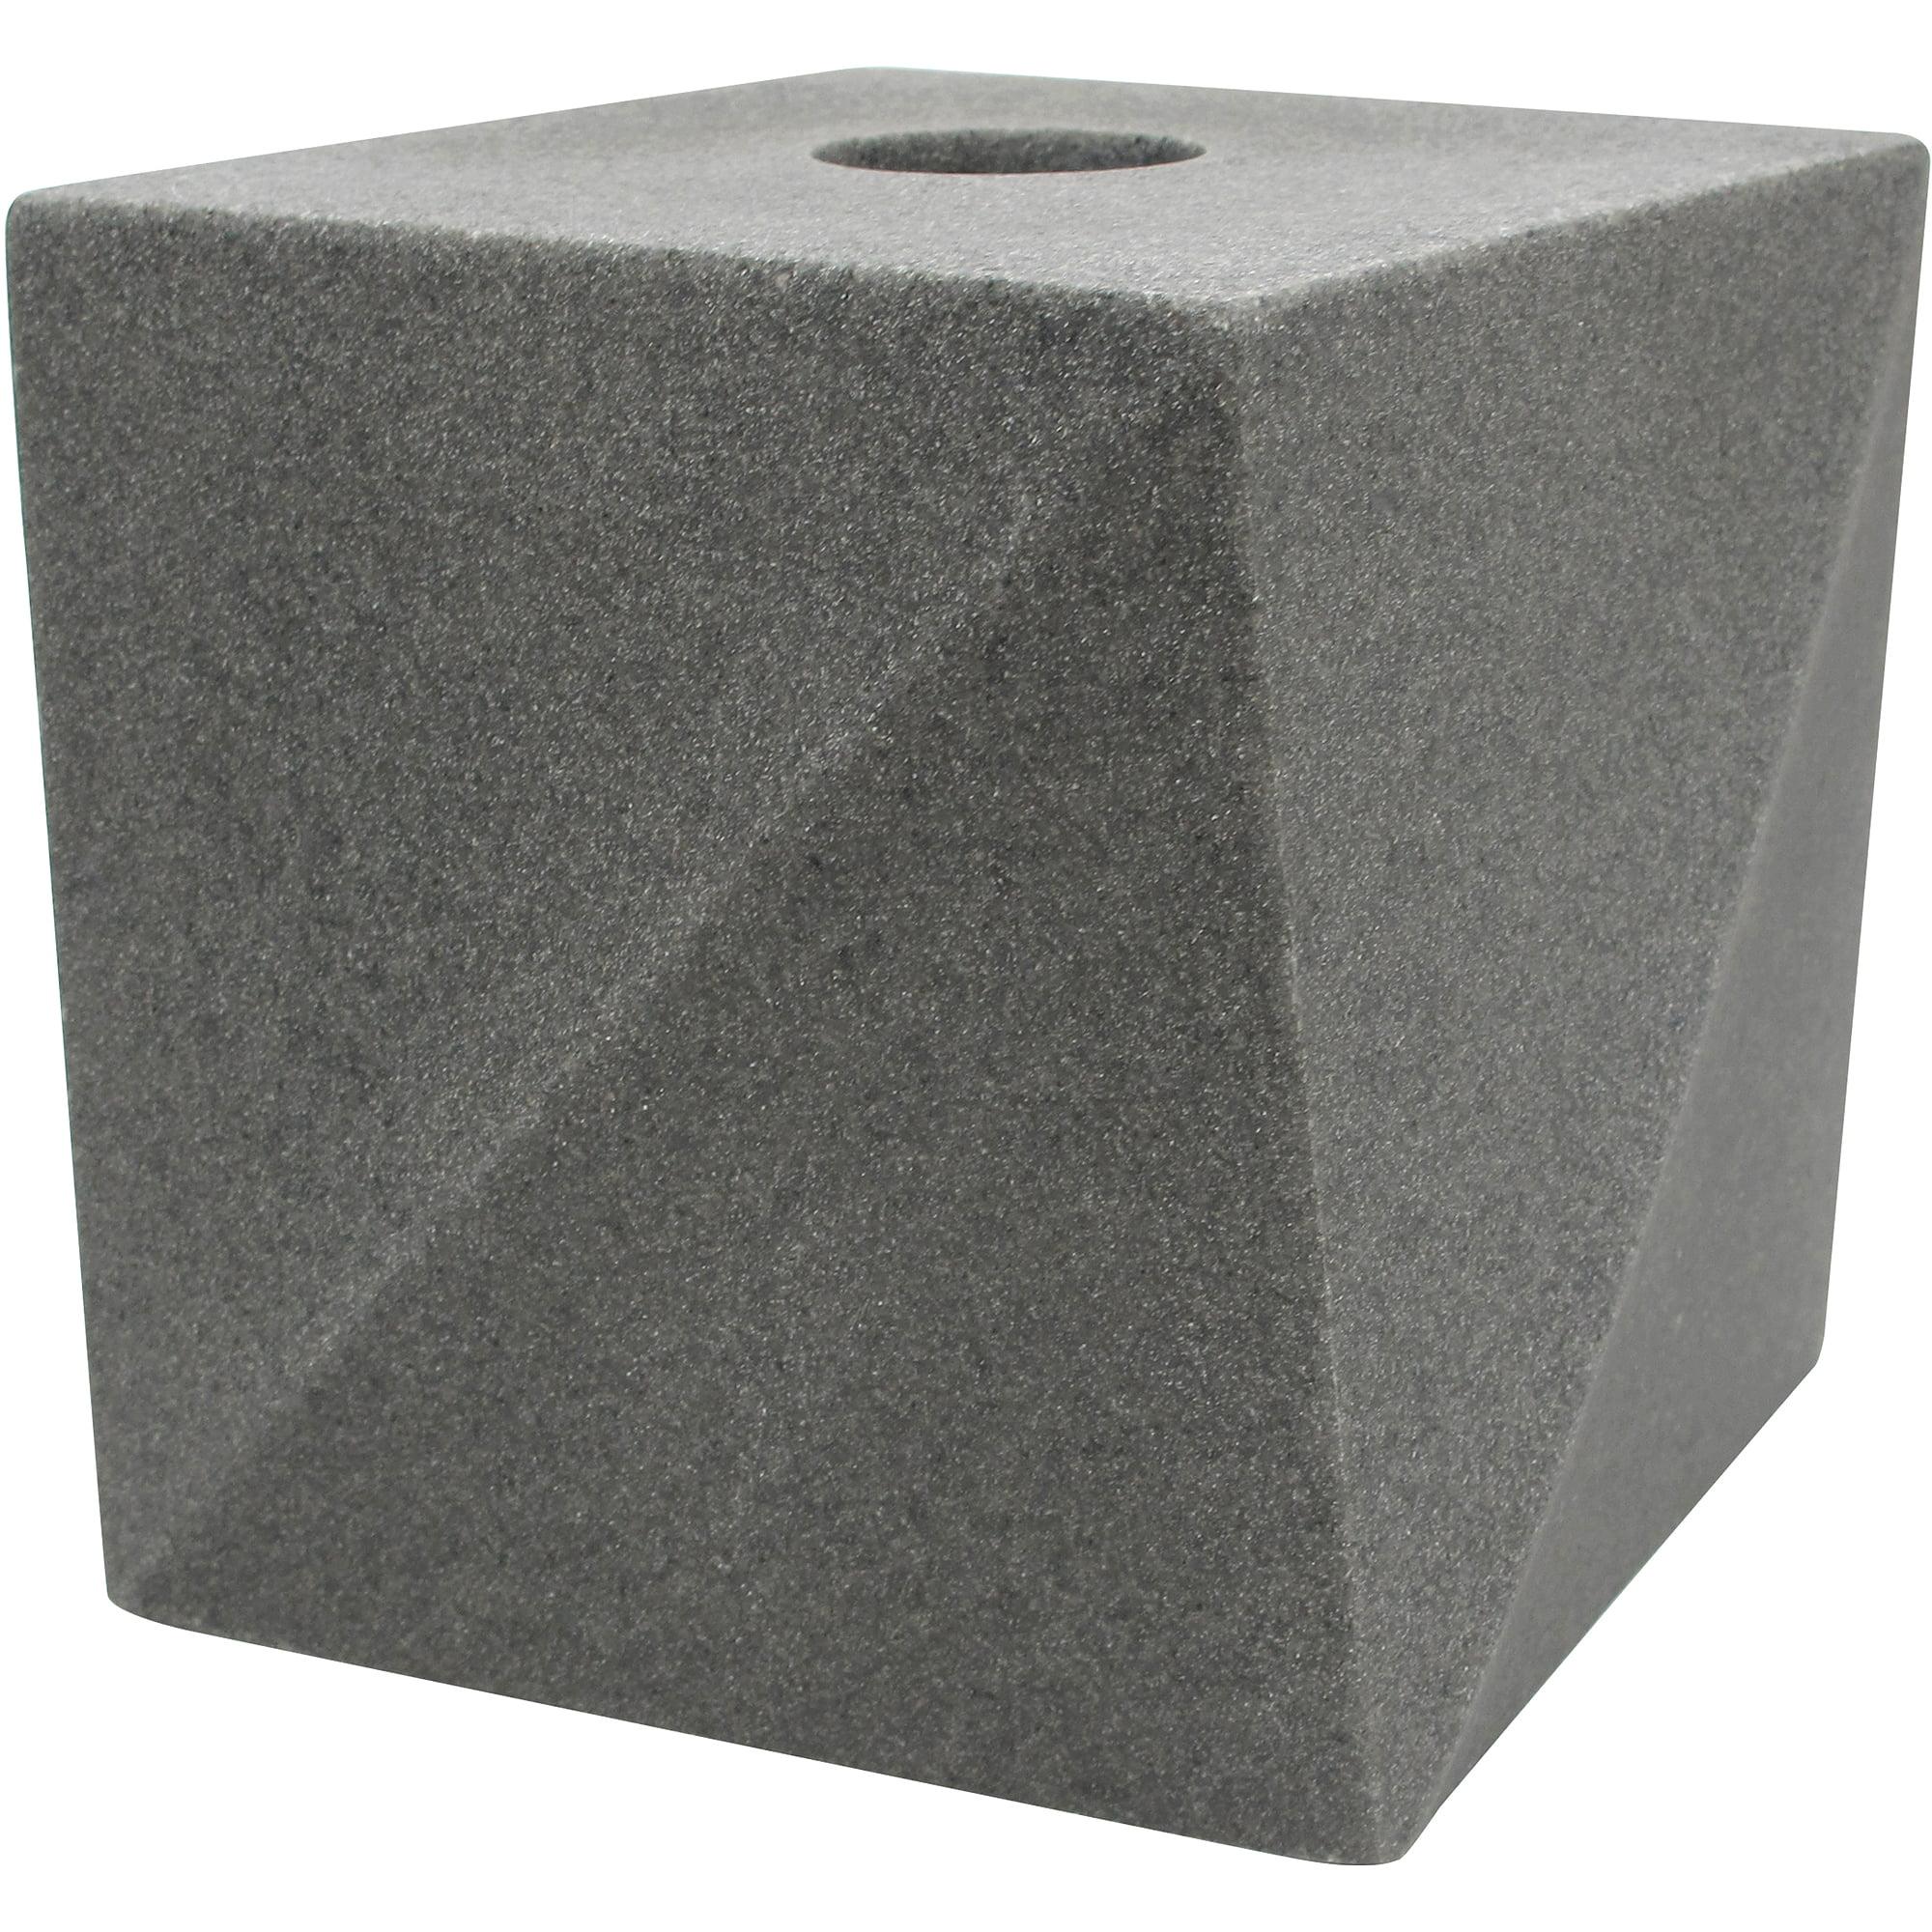 Allure Geo Stone Tissue Box